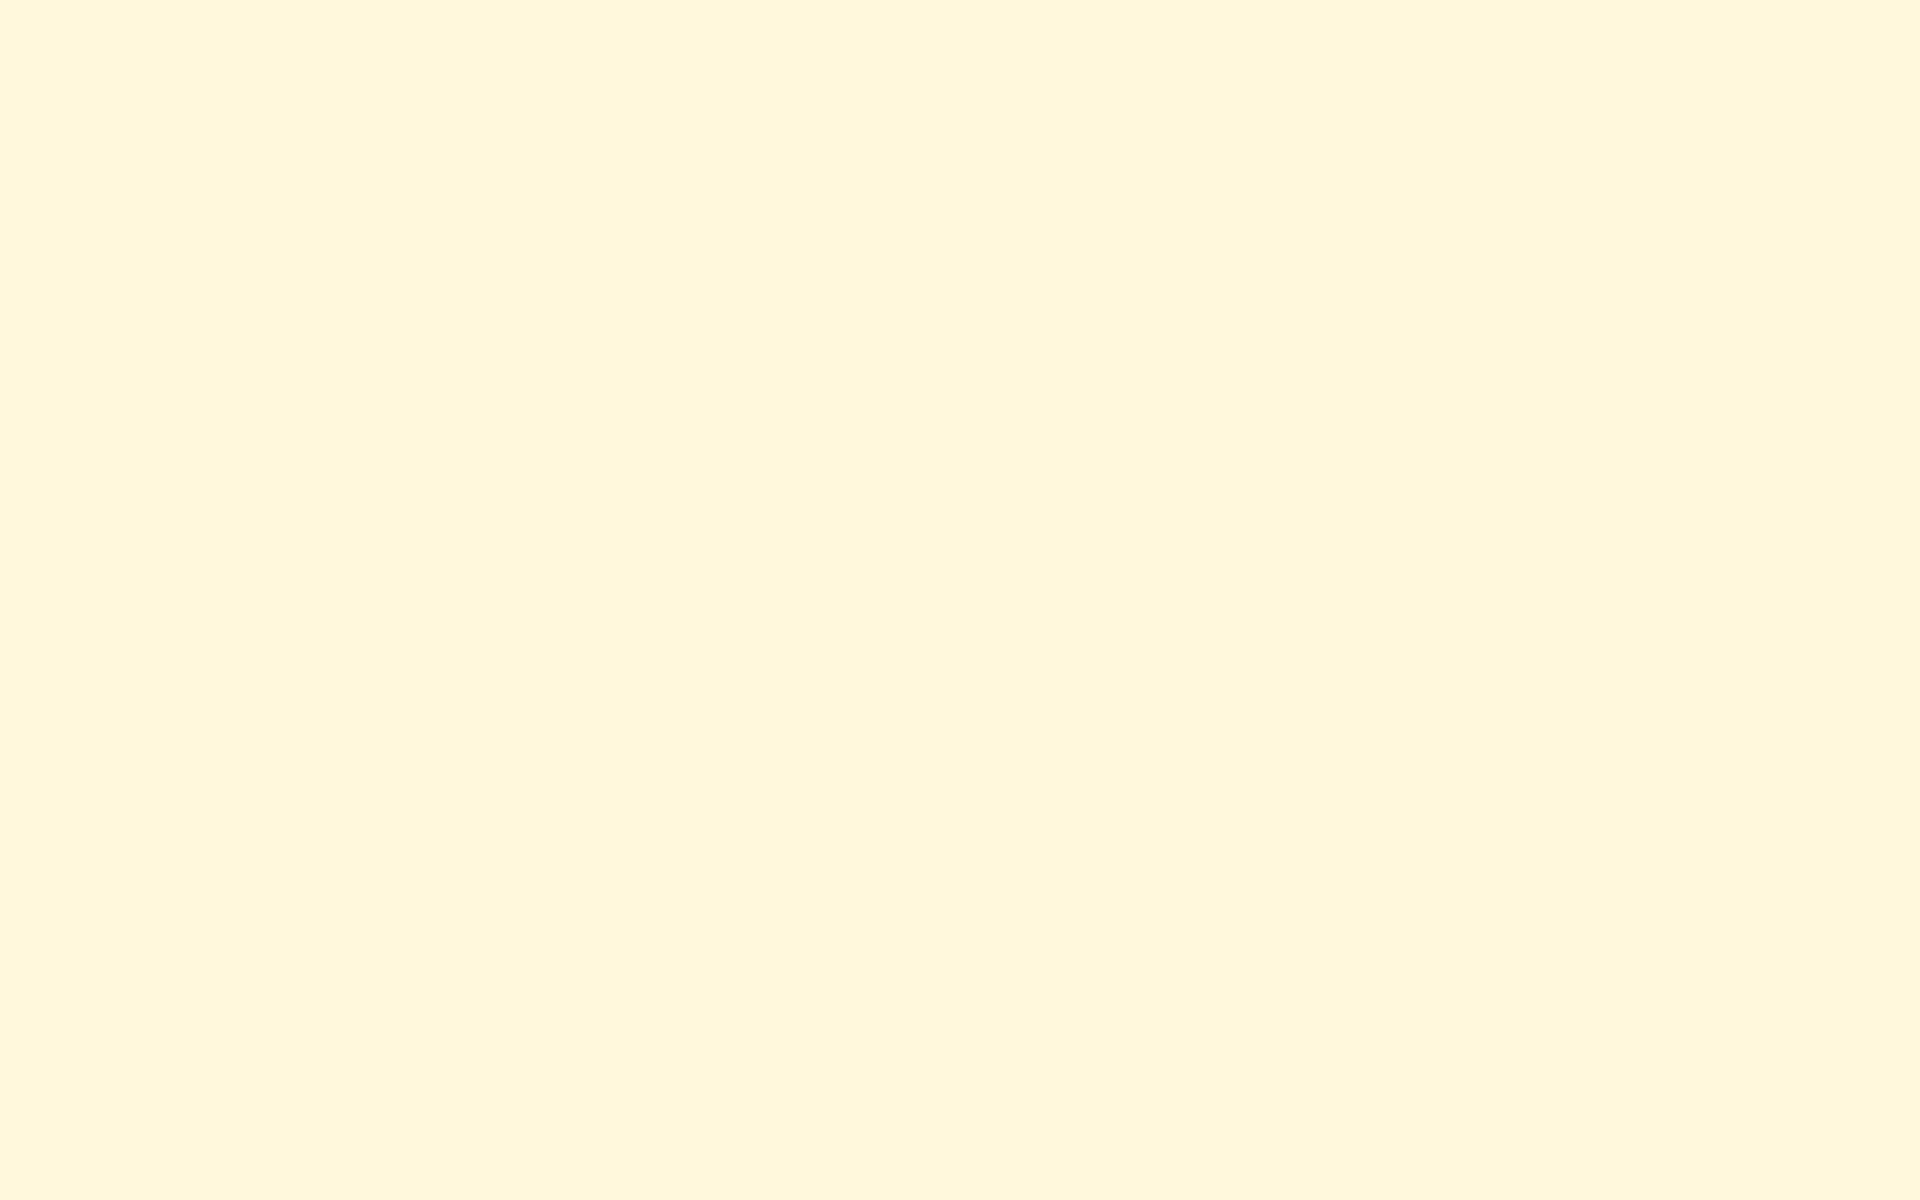 1920x1200 Cornsilk Solid Color Background